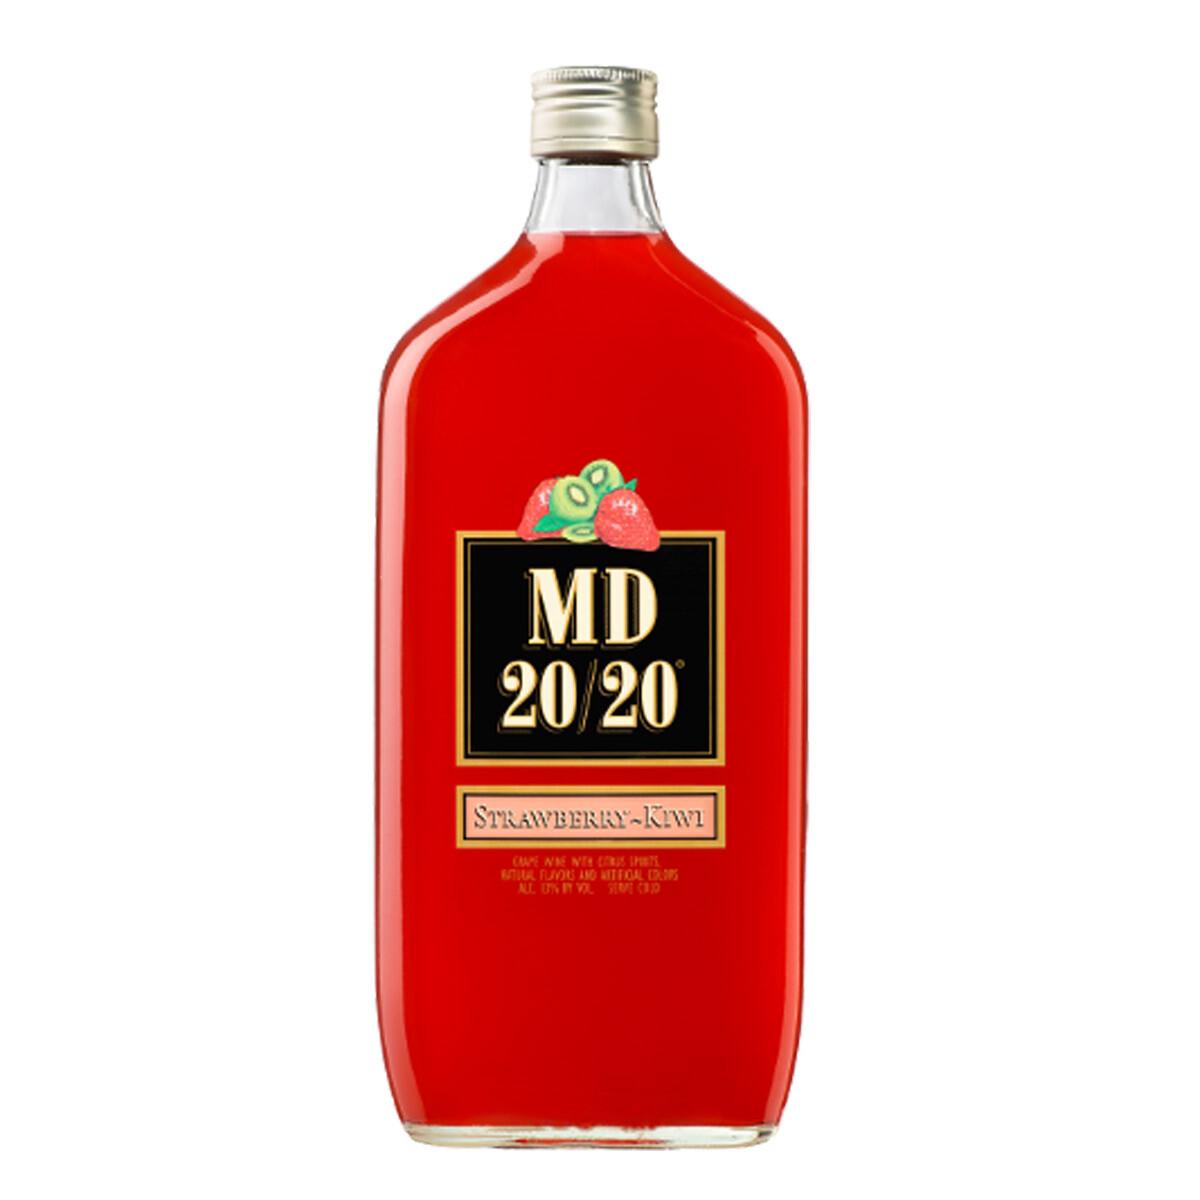 MD 20/20 STRAWBERRY KIWI Alc. 13% Vol. 750ml